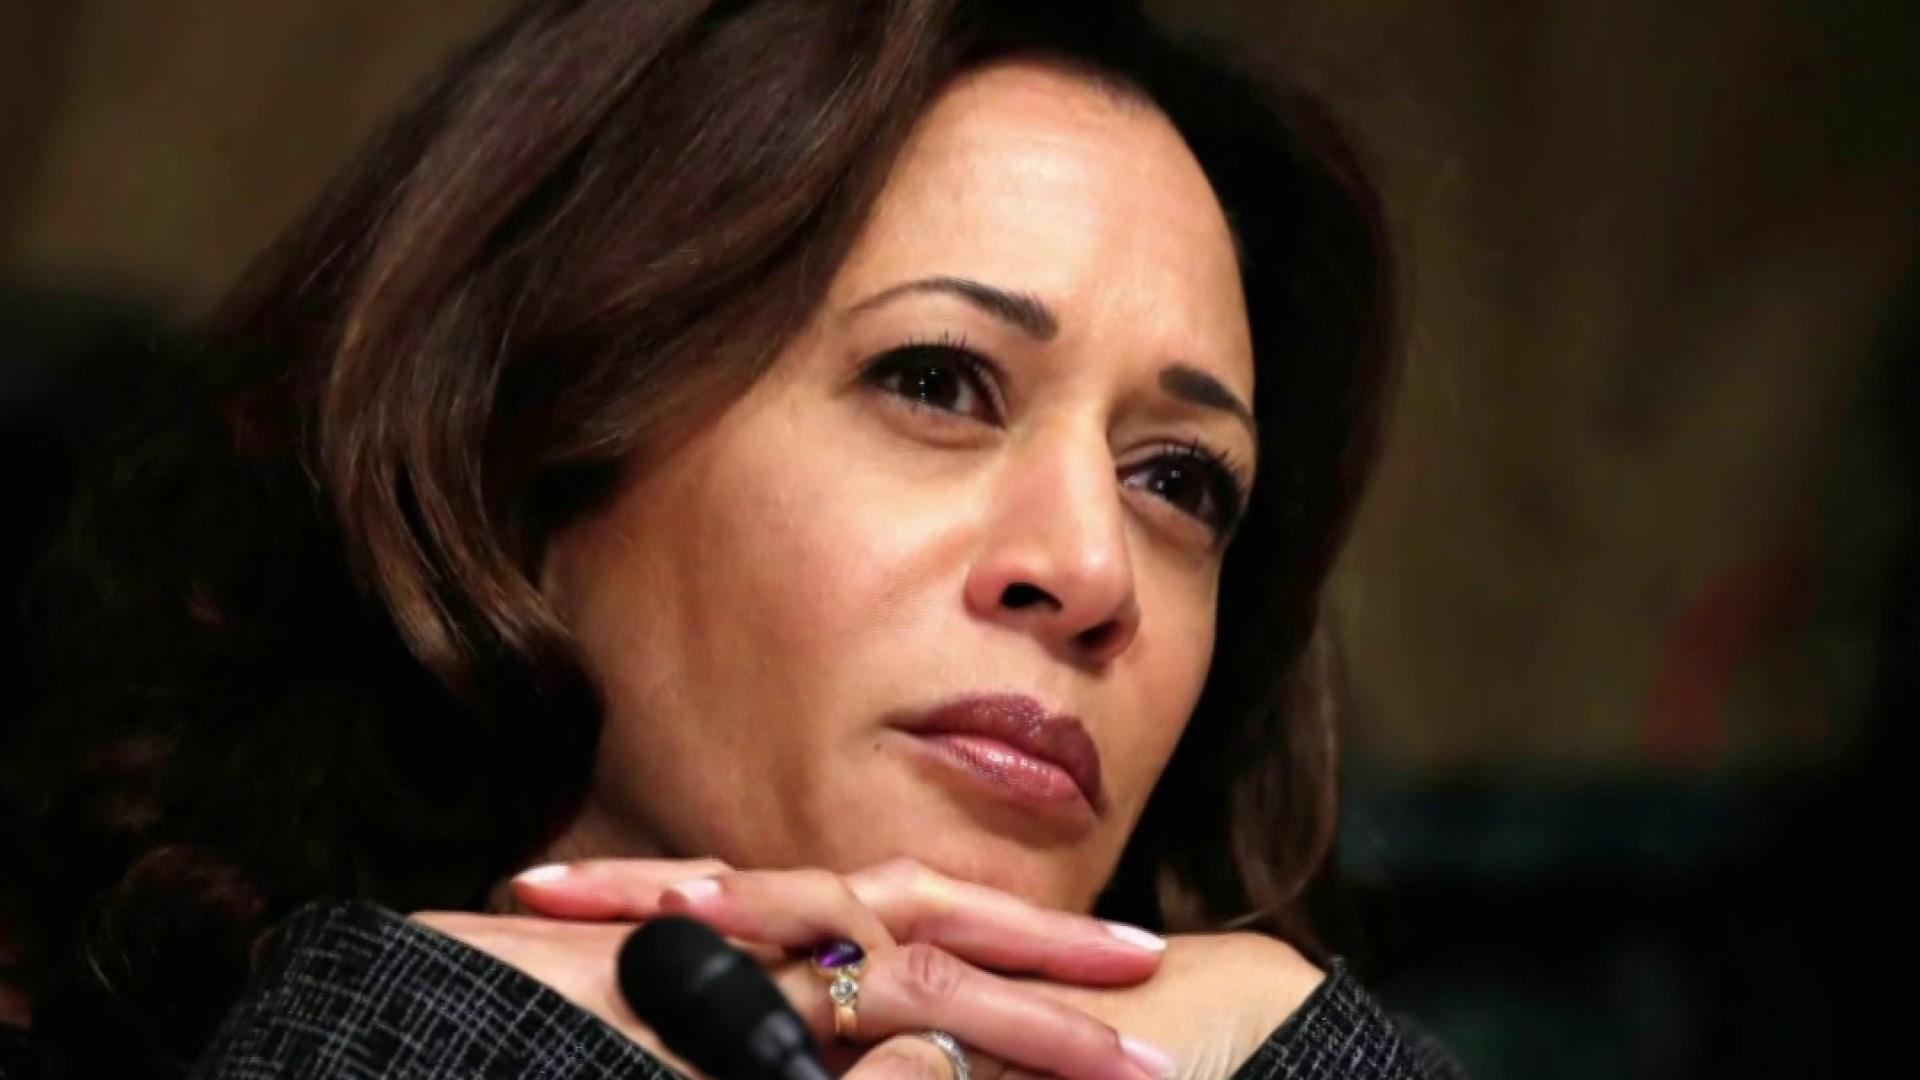 Beschloss: Harris is a walking rebuke of Trump's racism and misogyny